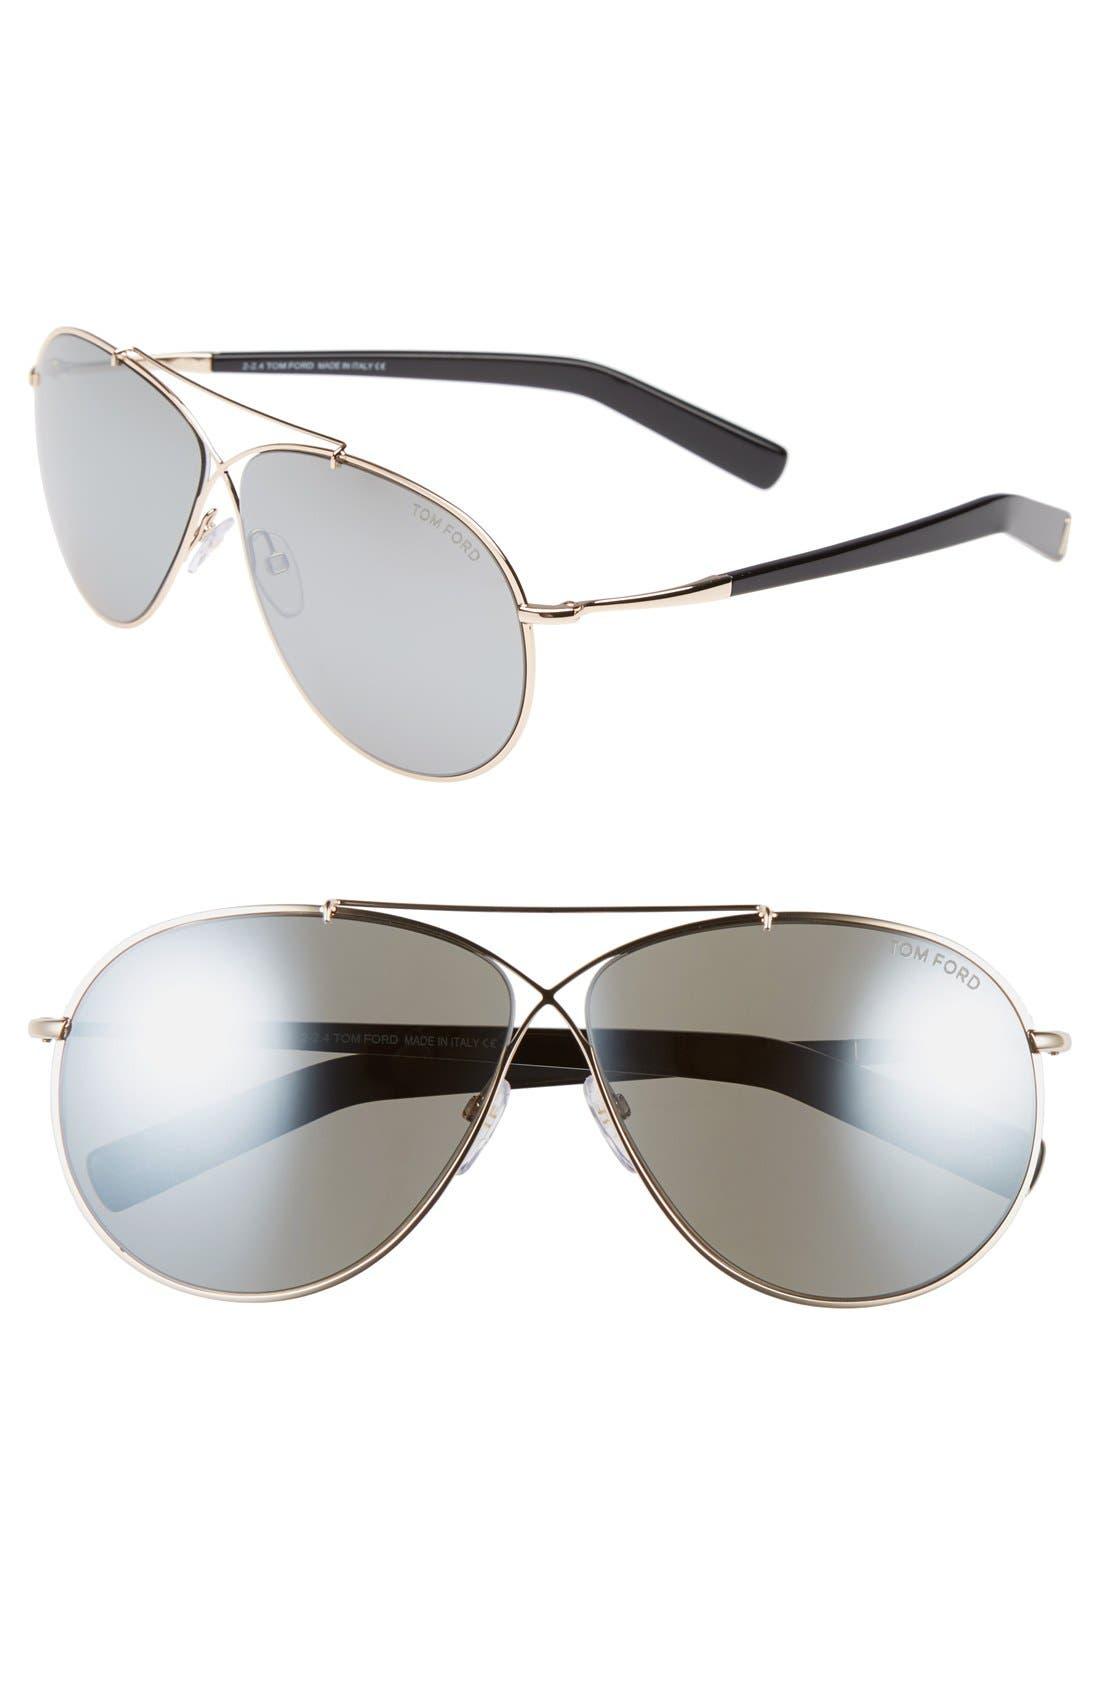 Main Image - Tom Ford 'Eva' 61mm Aviator Sunglasses